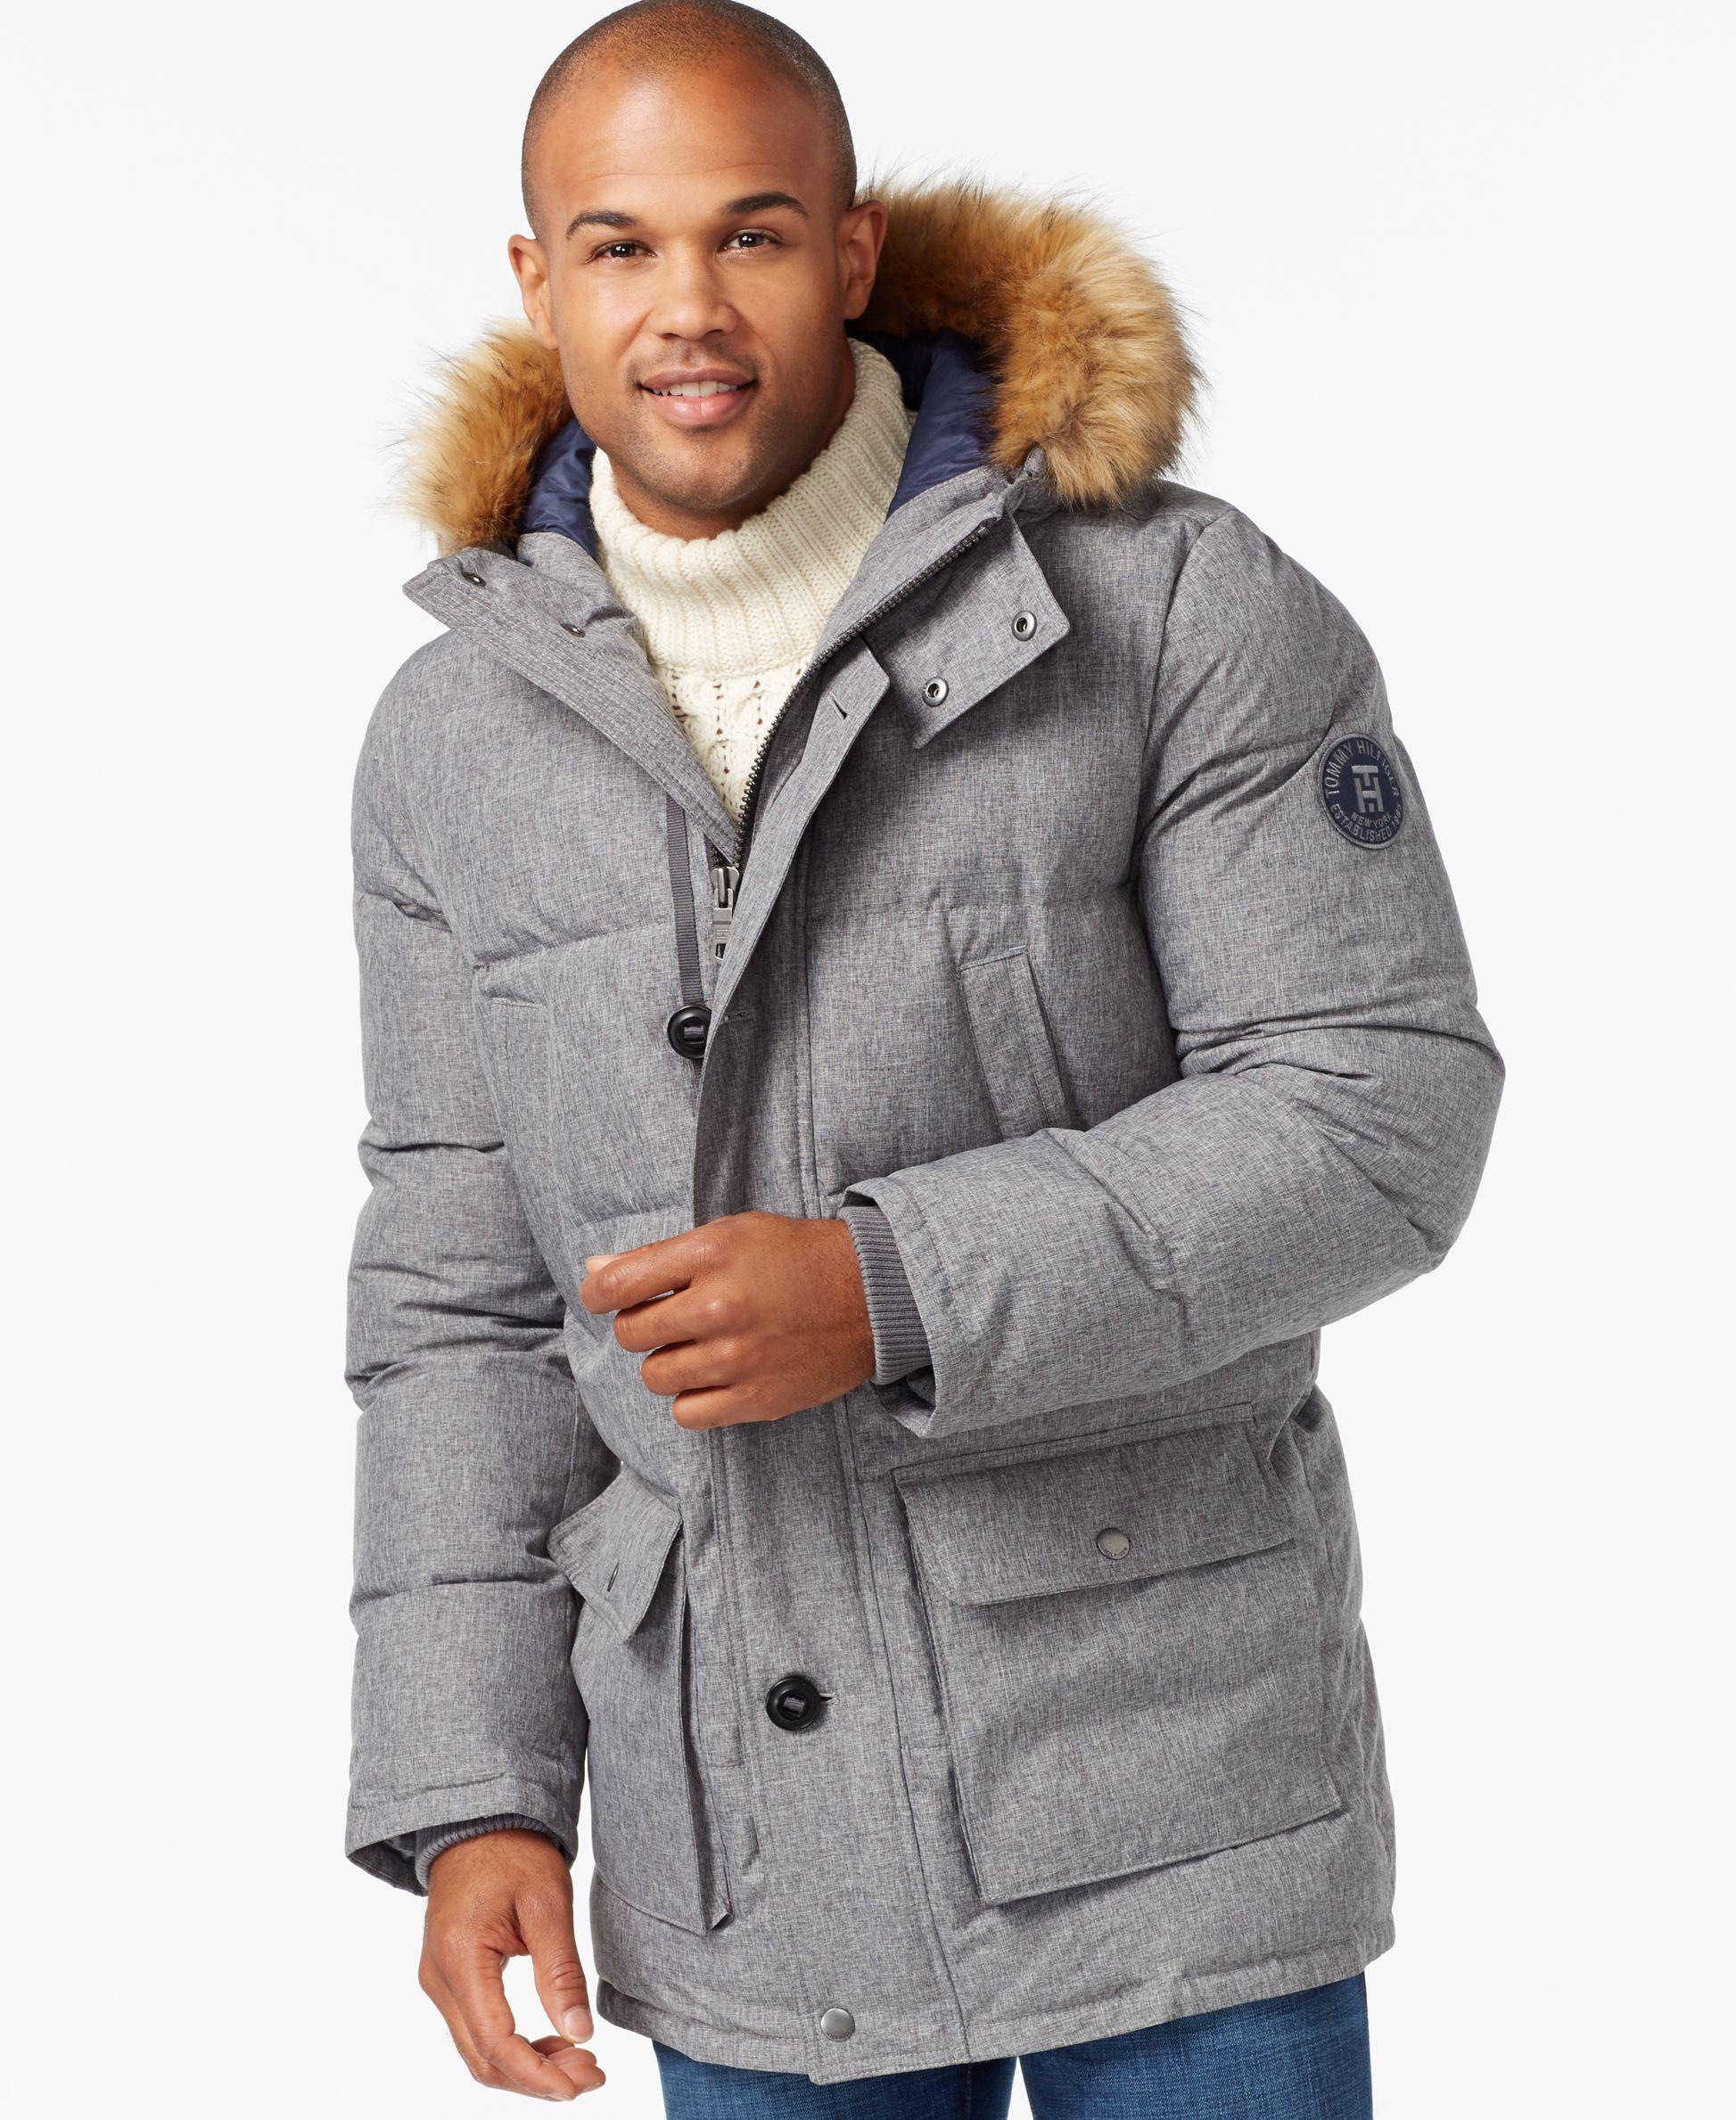 189cd3e8 Long Snorkel Coat | Men's styles | Tommy hilfiger jackets, Tommy ...